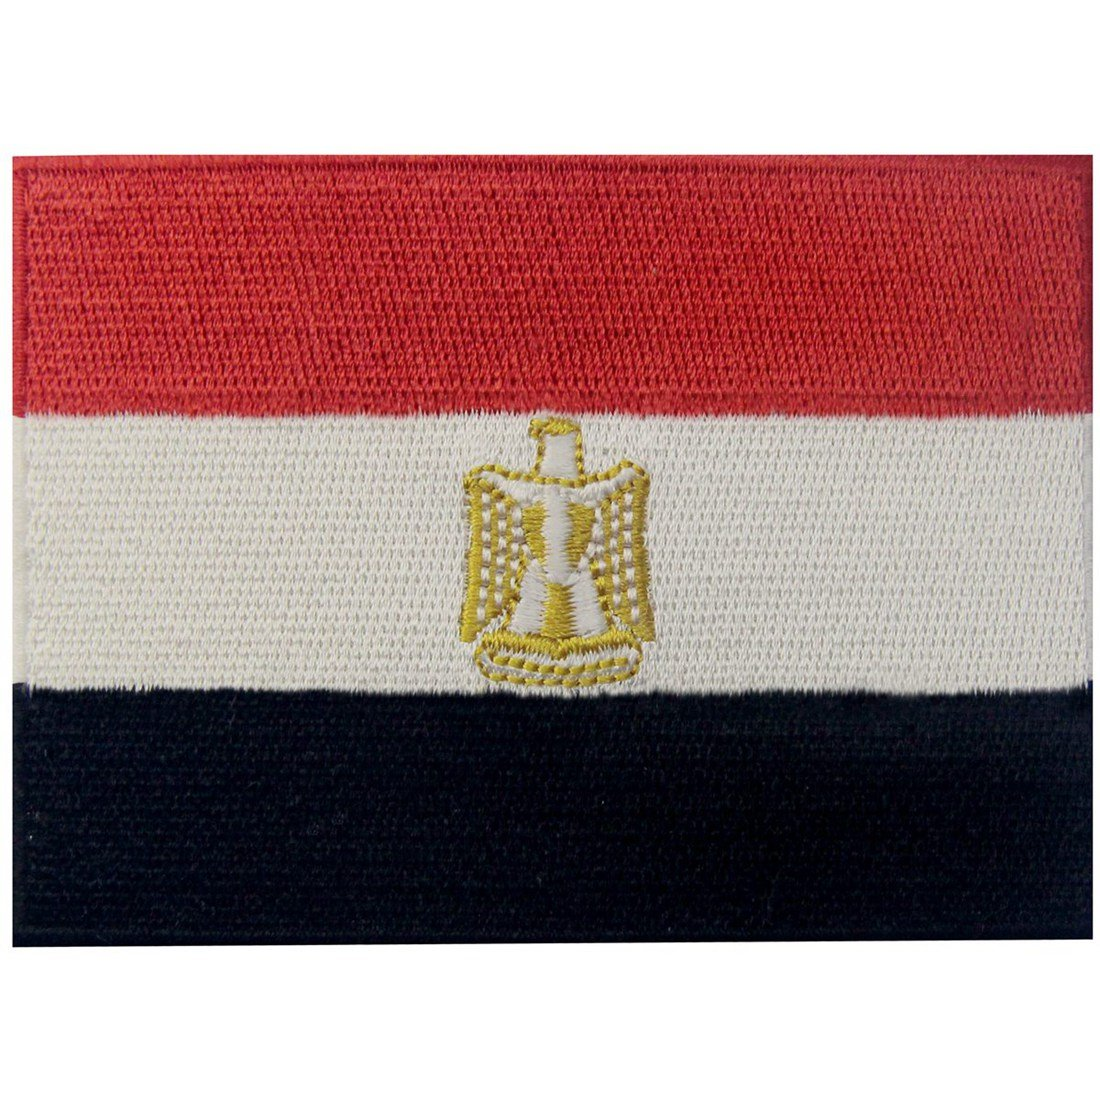 Bandera de Egipto /Árabe egipcio Parche Bordado de Aplicaci/ón con Plancha